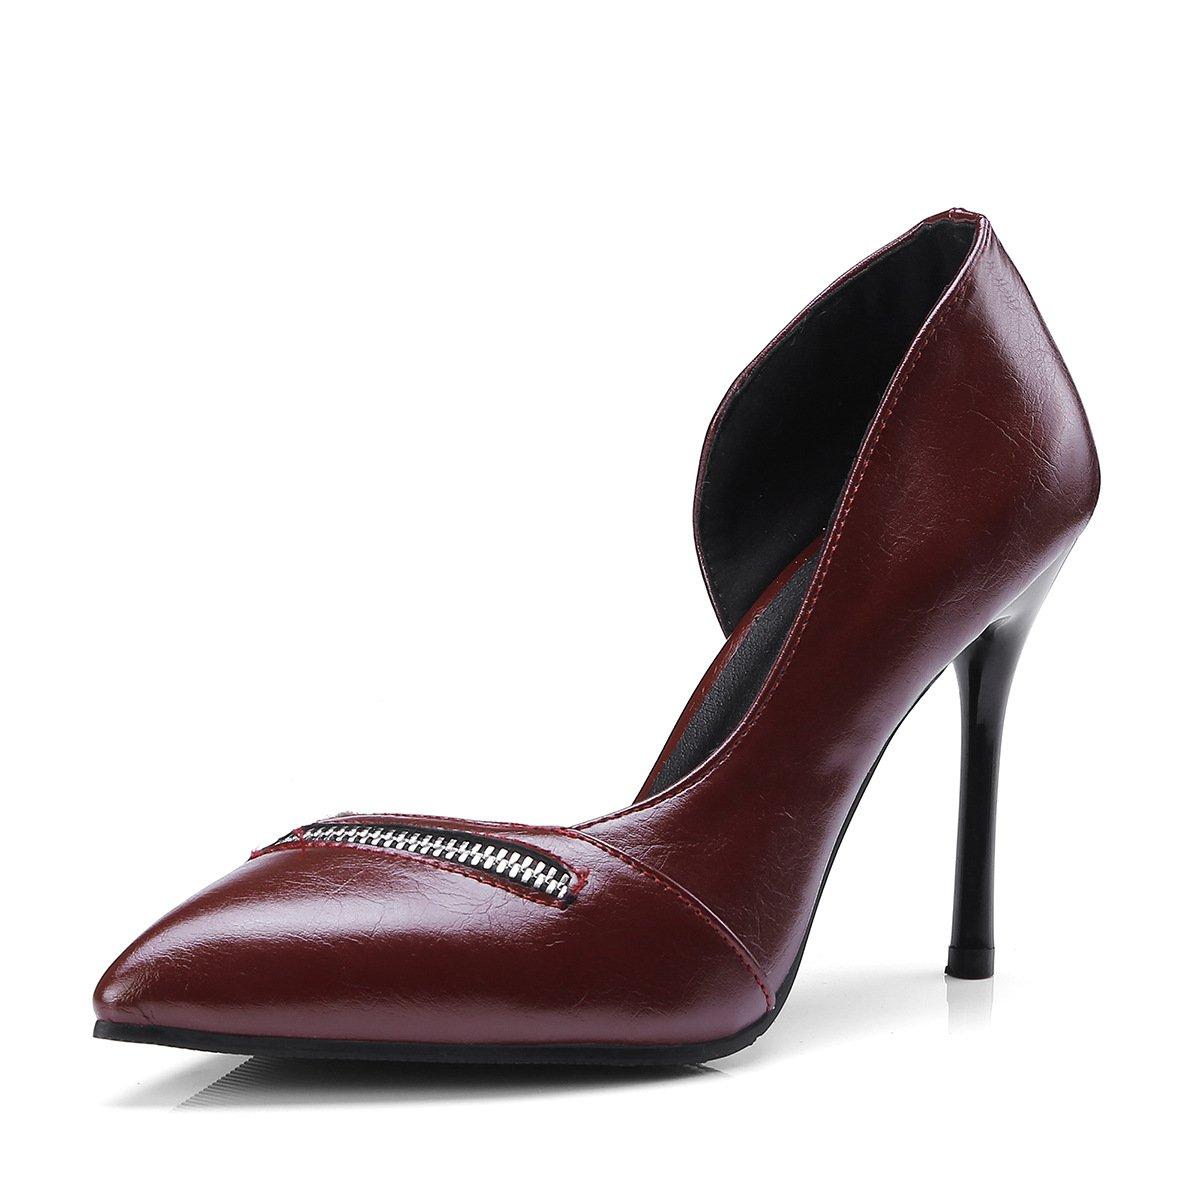 QIN&X Frauen Wies Wies Frauen Toe Heel Sandalen Wine ROT ad6226